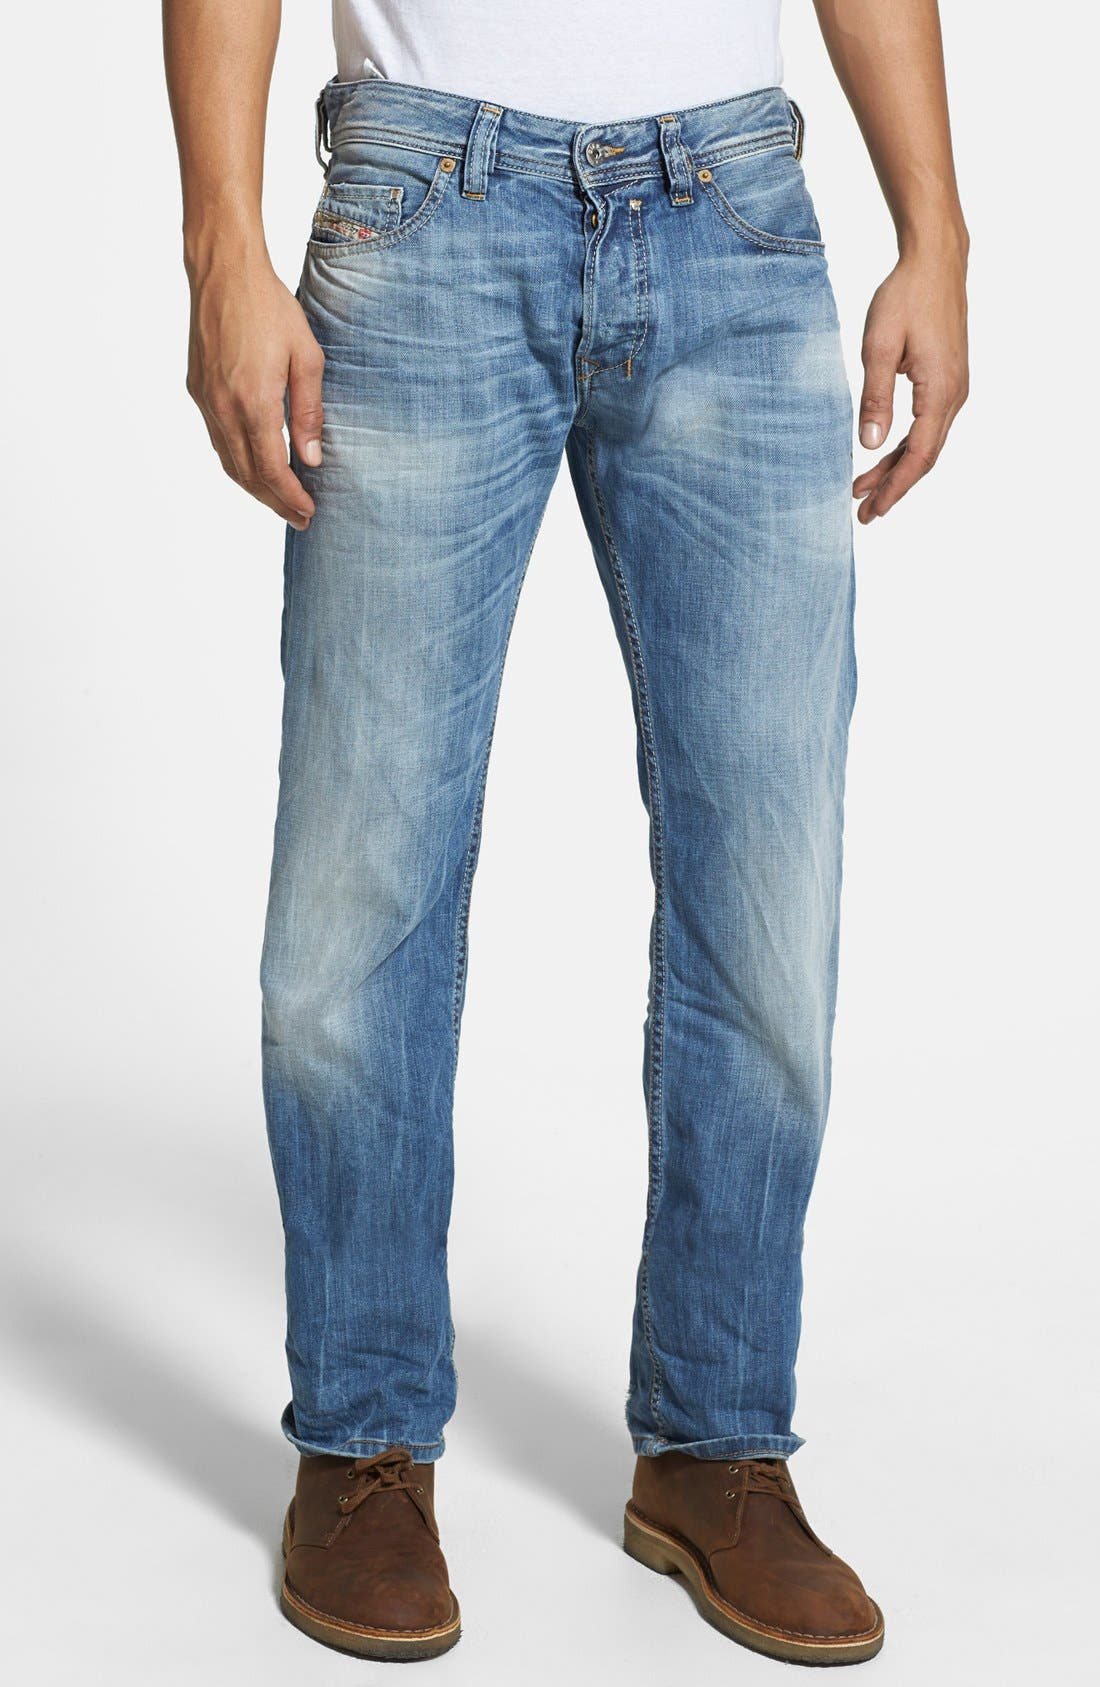 Main Image - DIESEL® 'Safado' Slim Fit Jeans (826D)